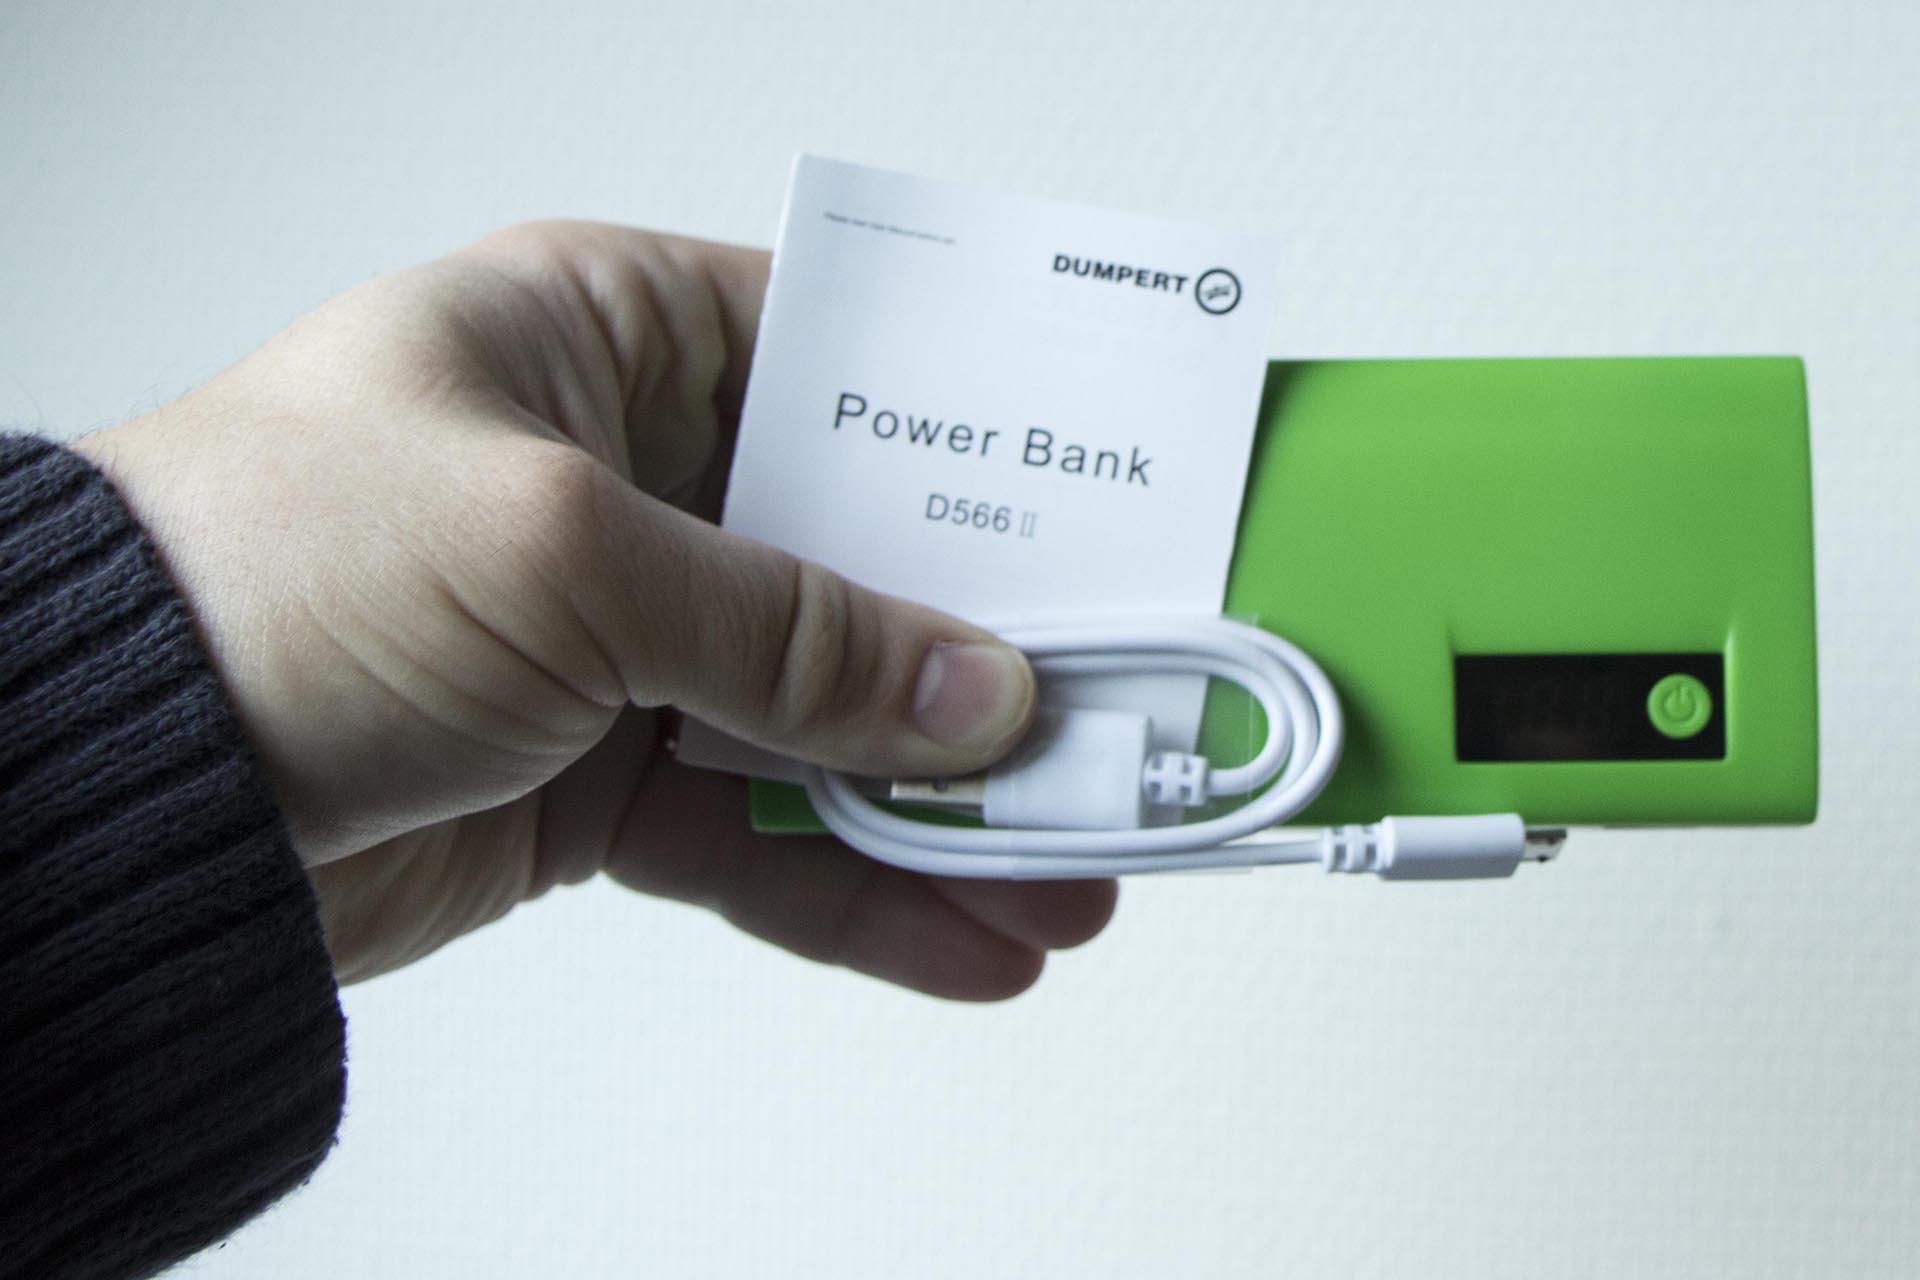 Dumpert Powerbank IMG_7518